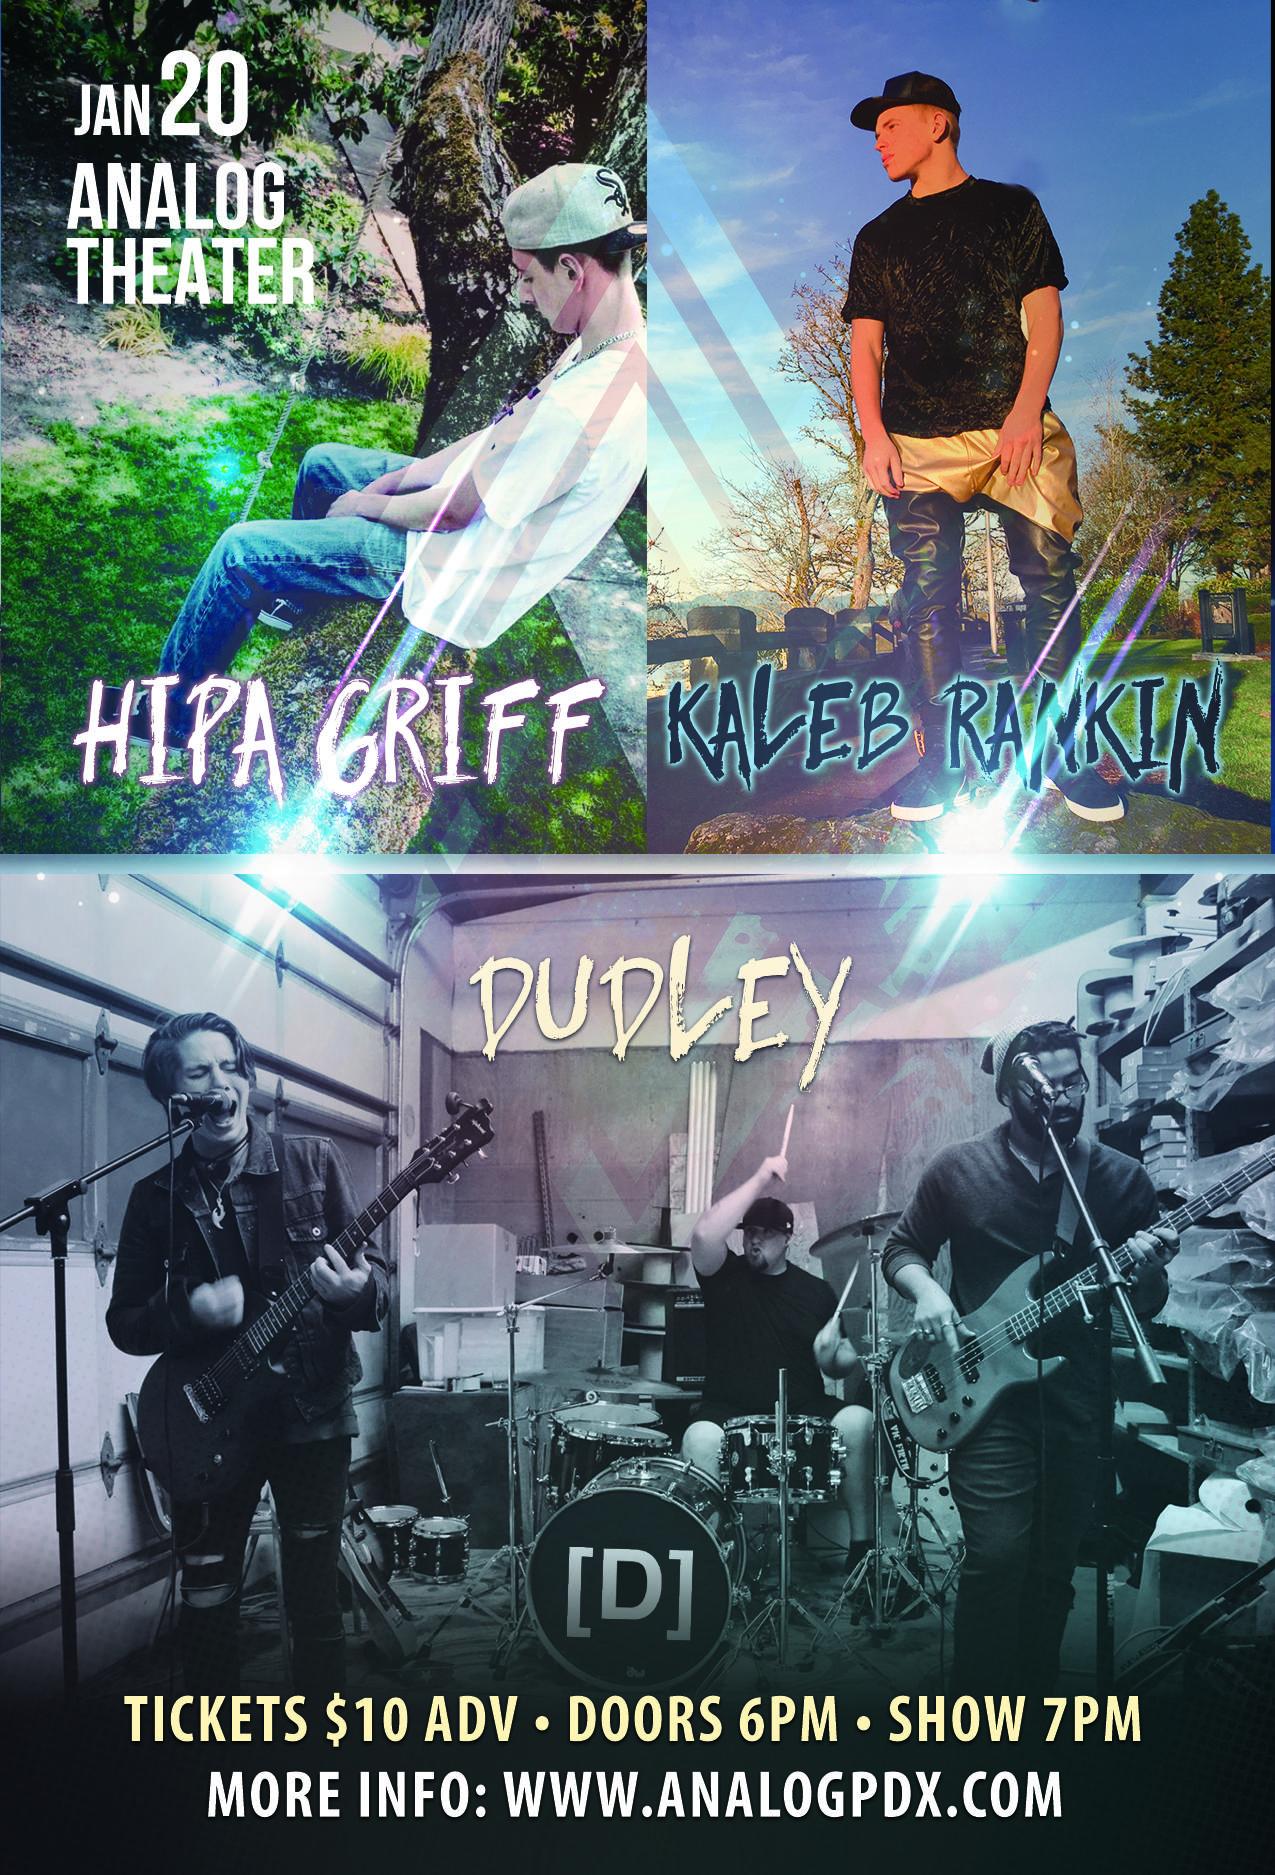 HipaGriff, Kaleb Rankin and Dudley